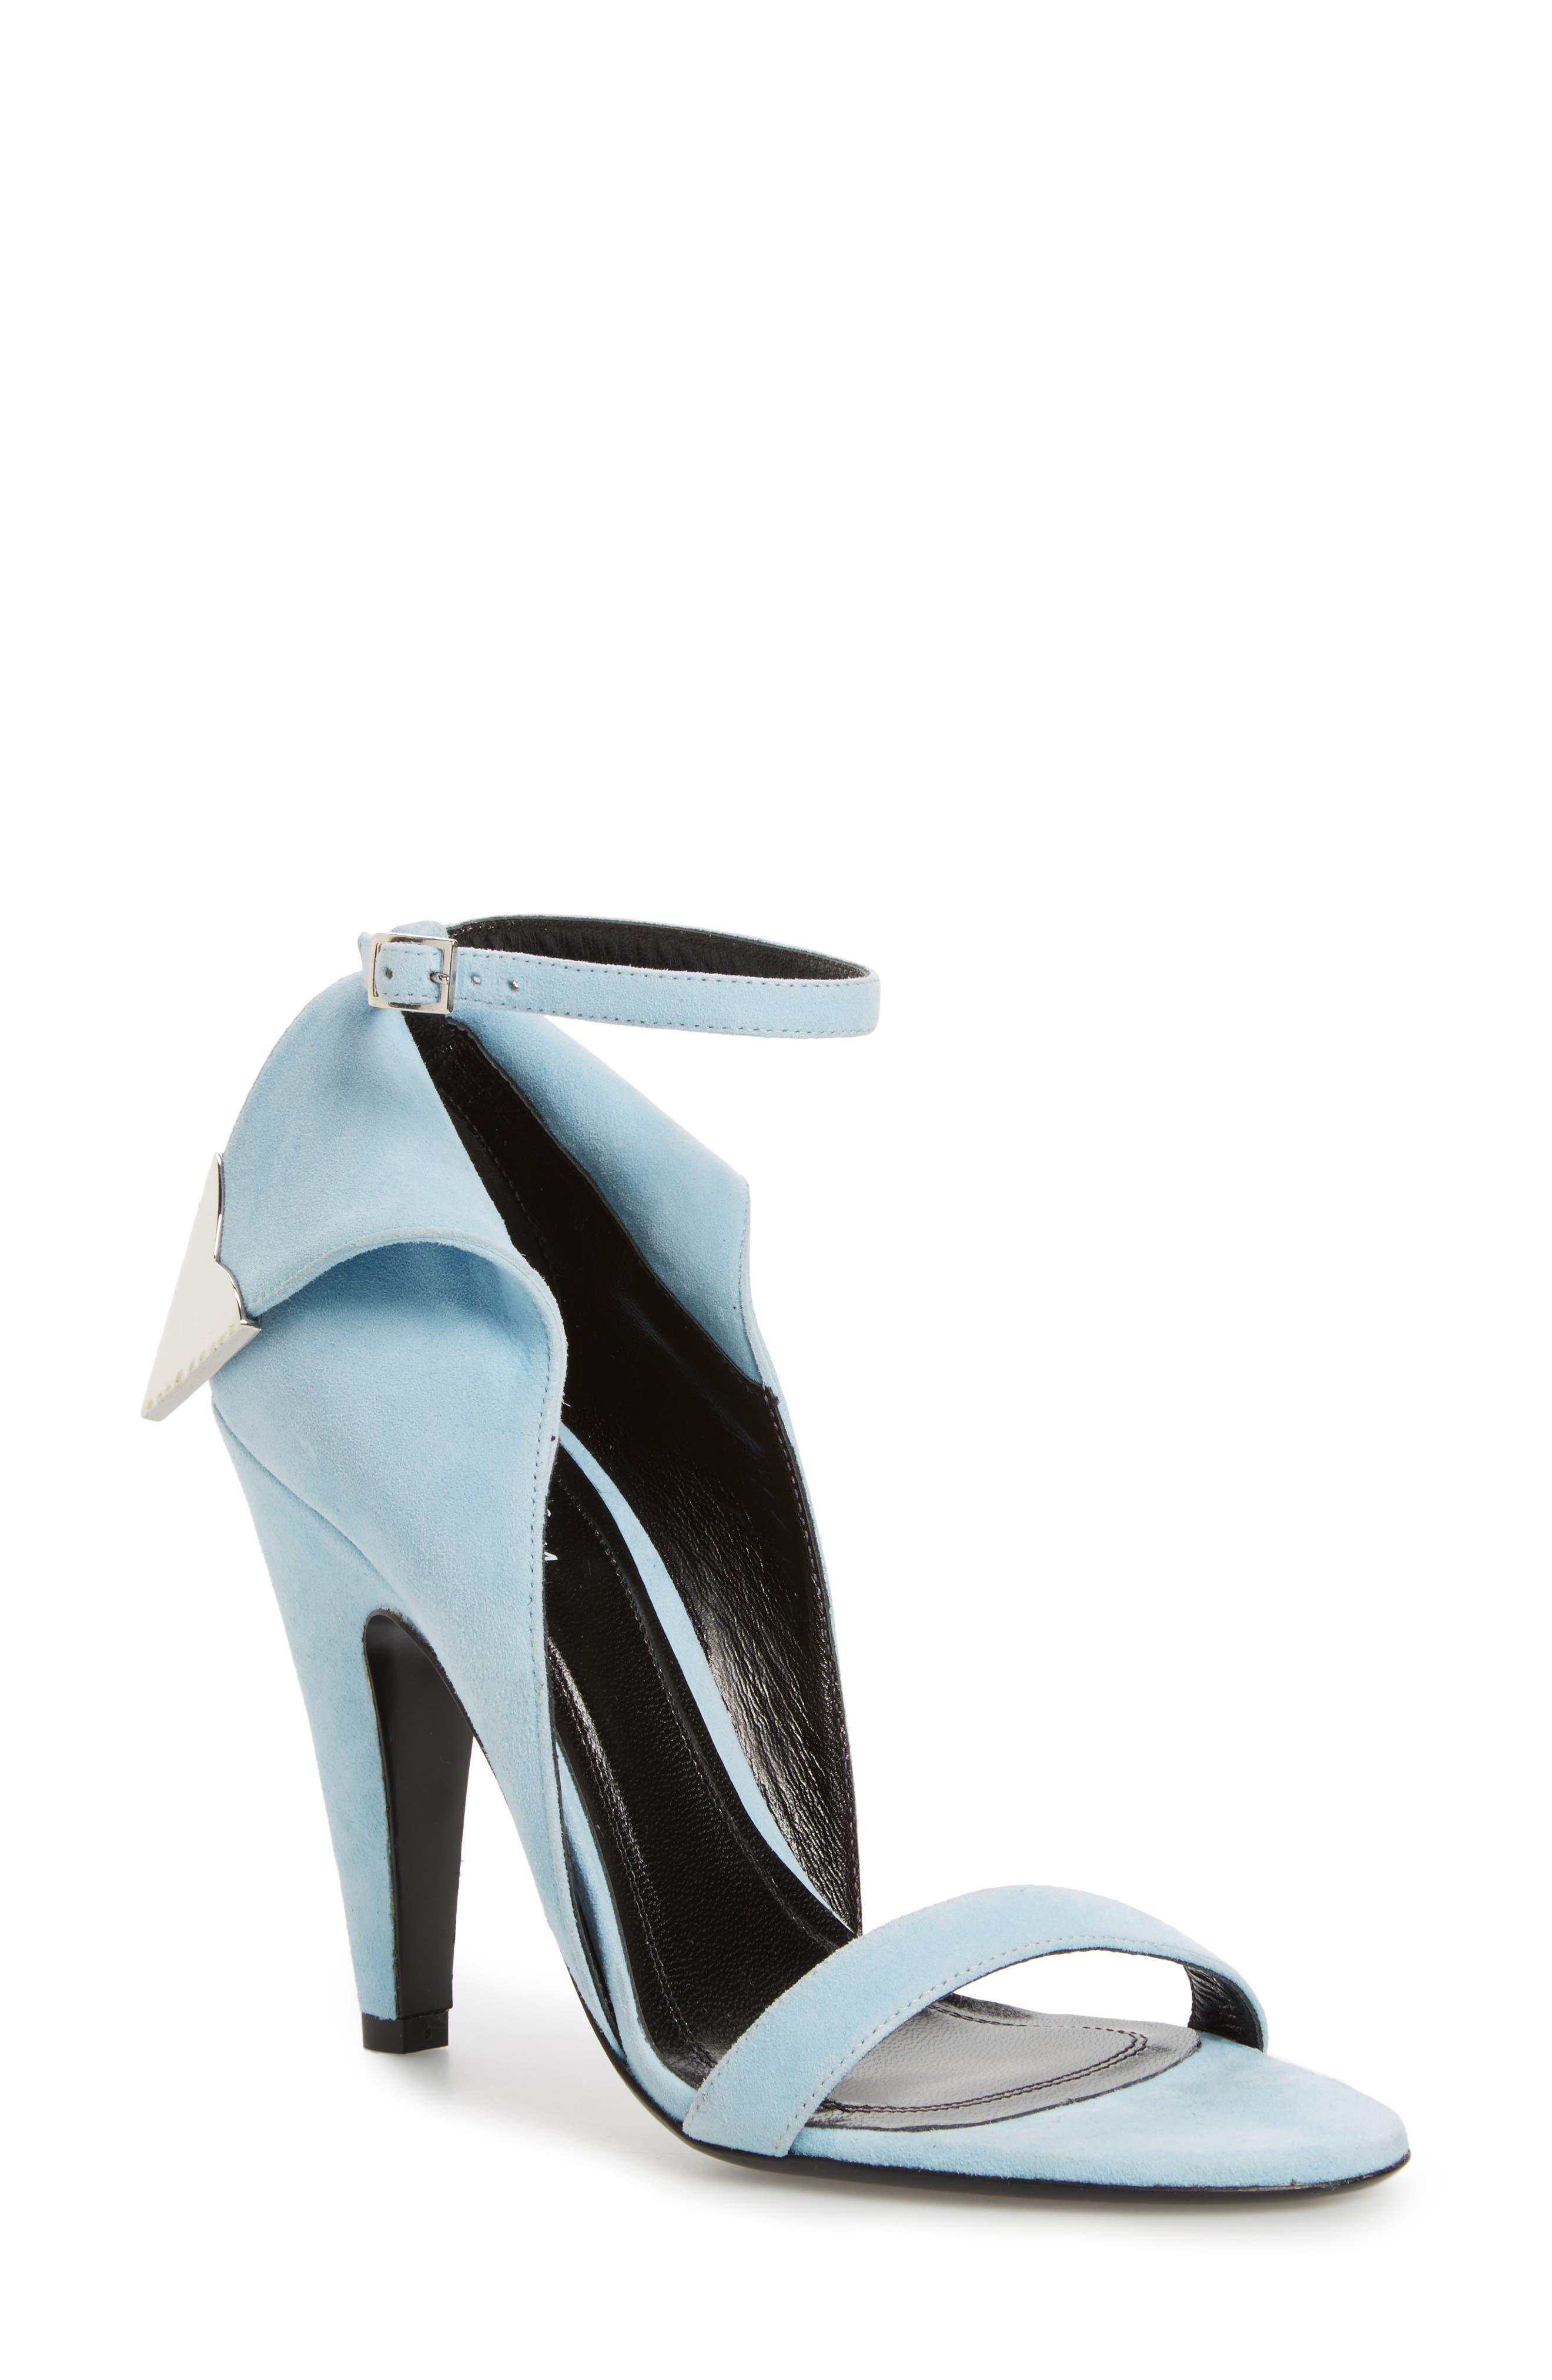 Leititia Ankle Strap Sandal,                             Main thumbnail 1, color,                             400